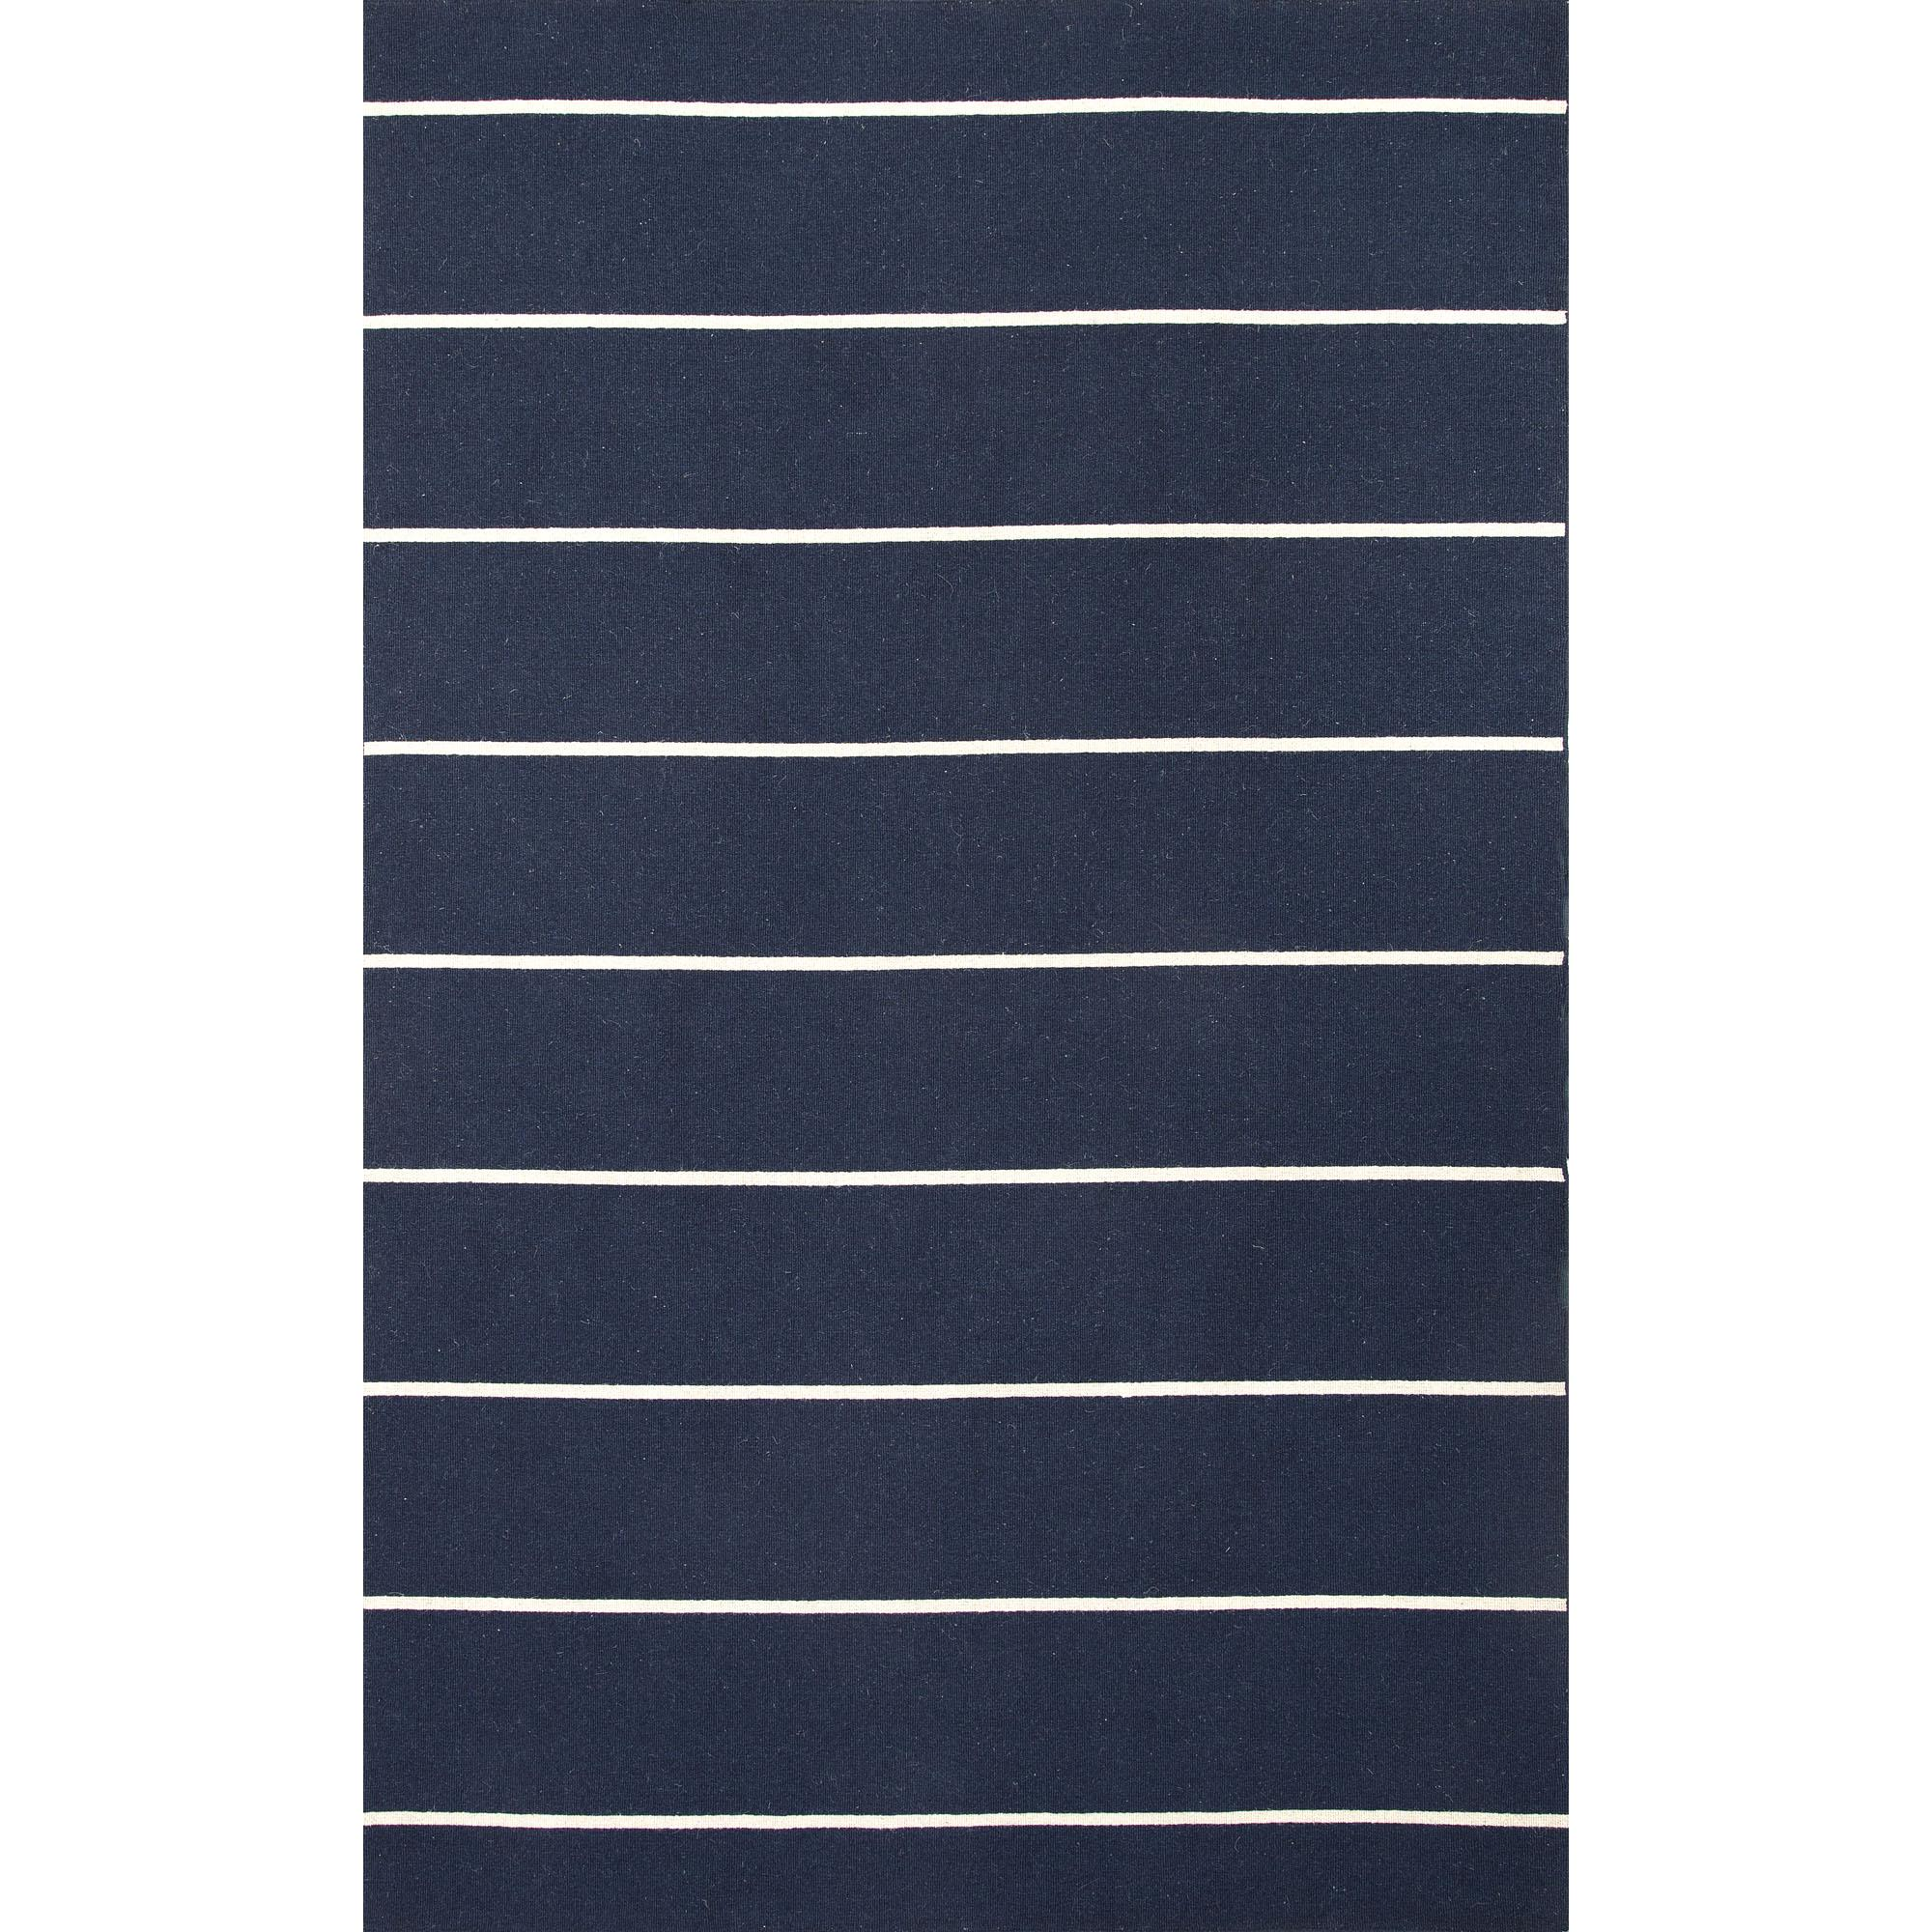 JAIPUR Rugs Coastal Shores 8 x 10 Rug - Item Number: RUG122746